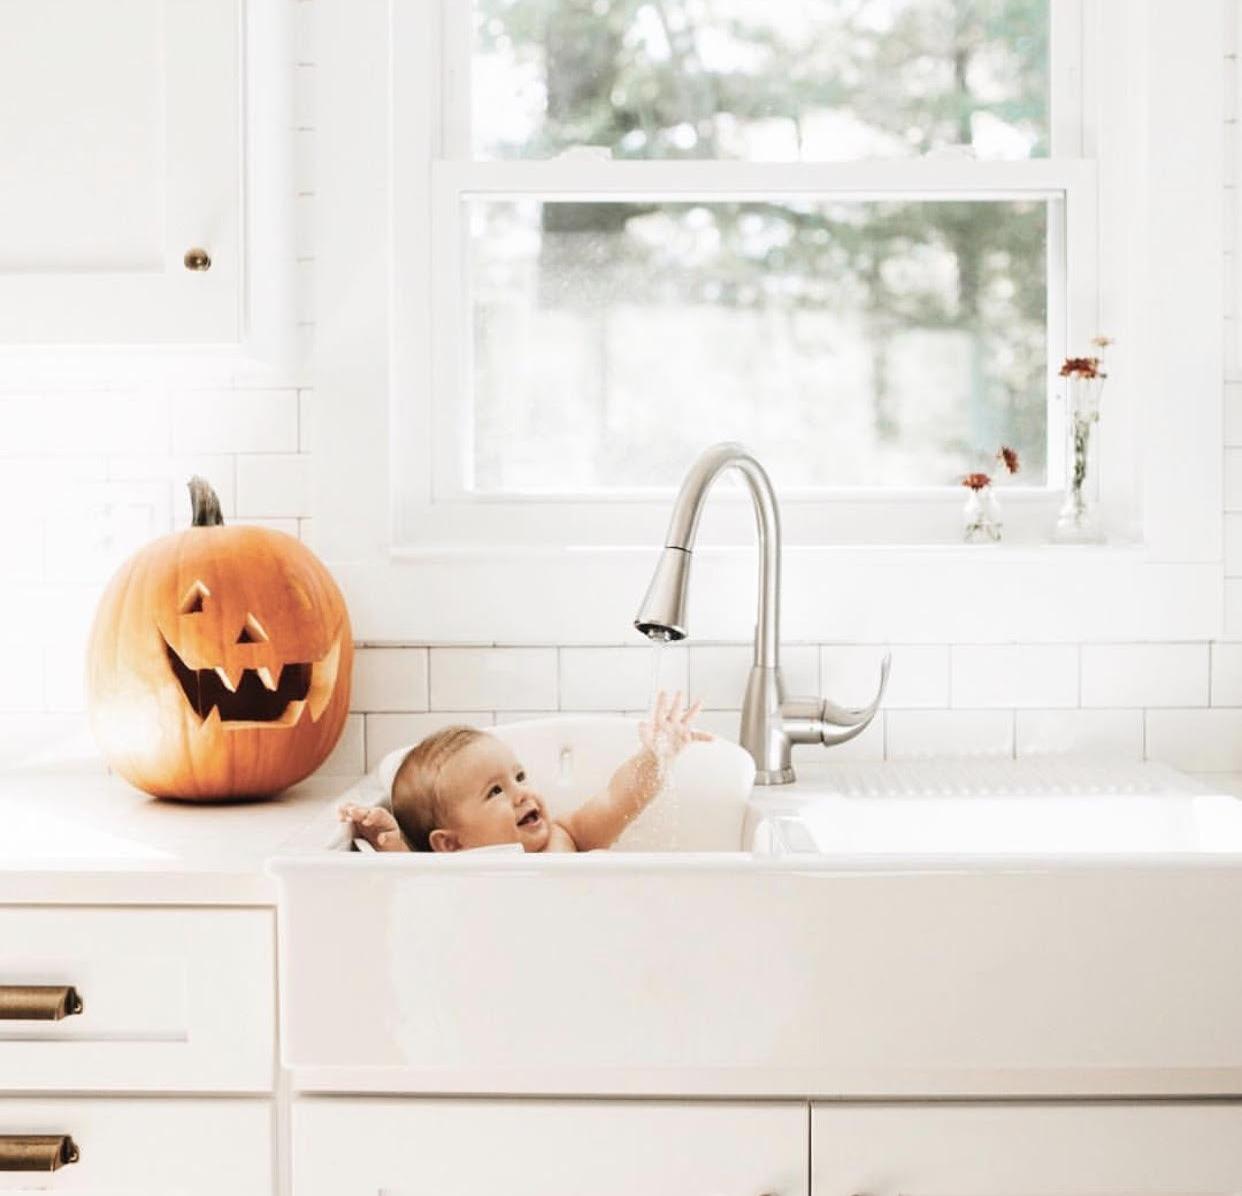 Pumpkin carving sink baths  via Melissa Brookes